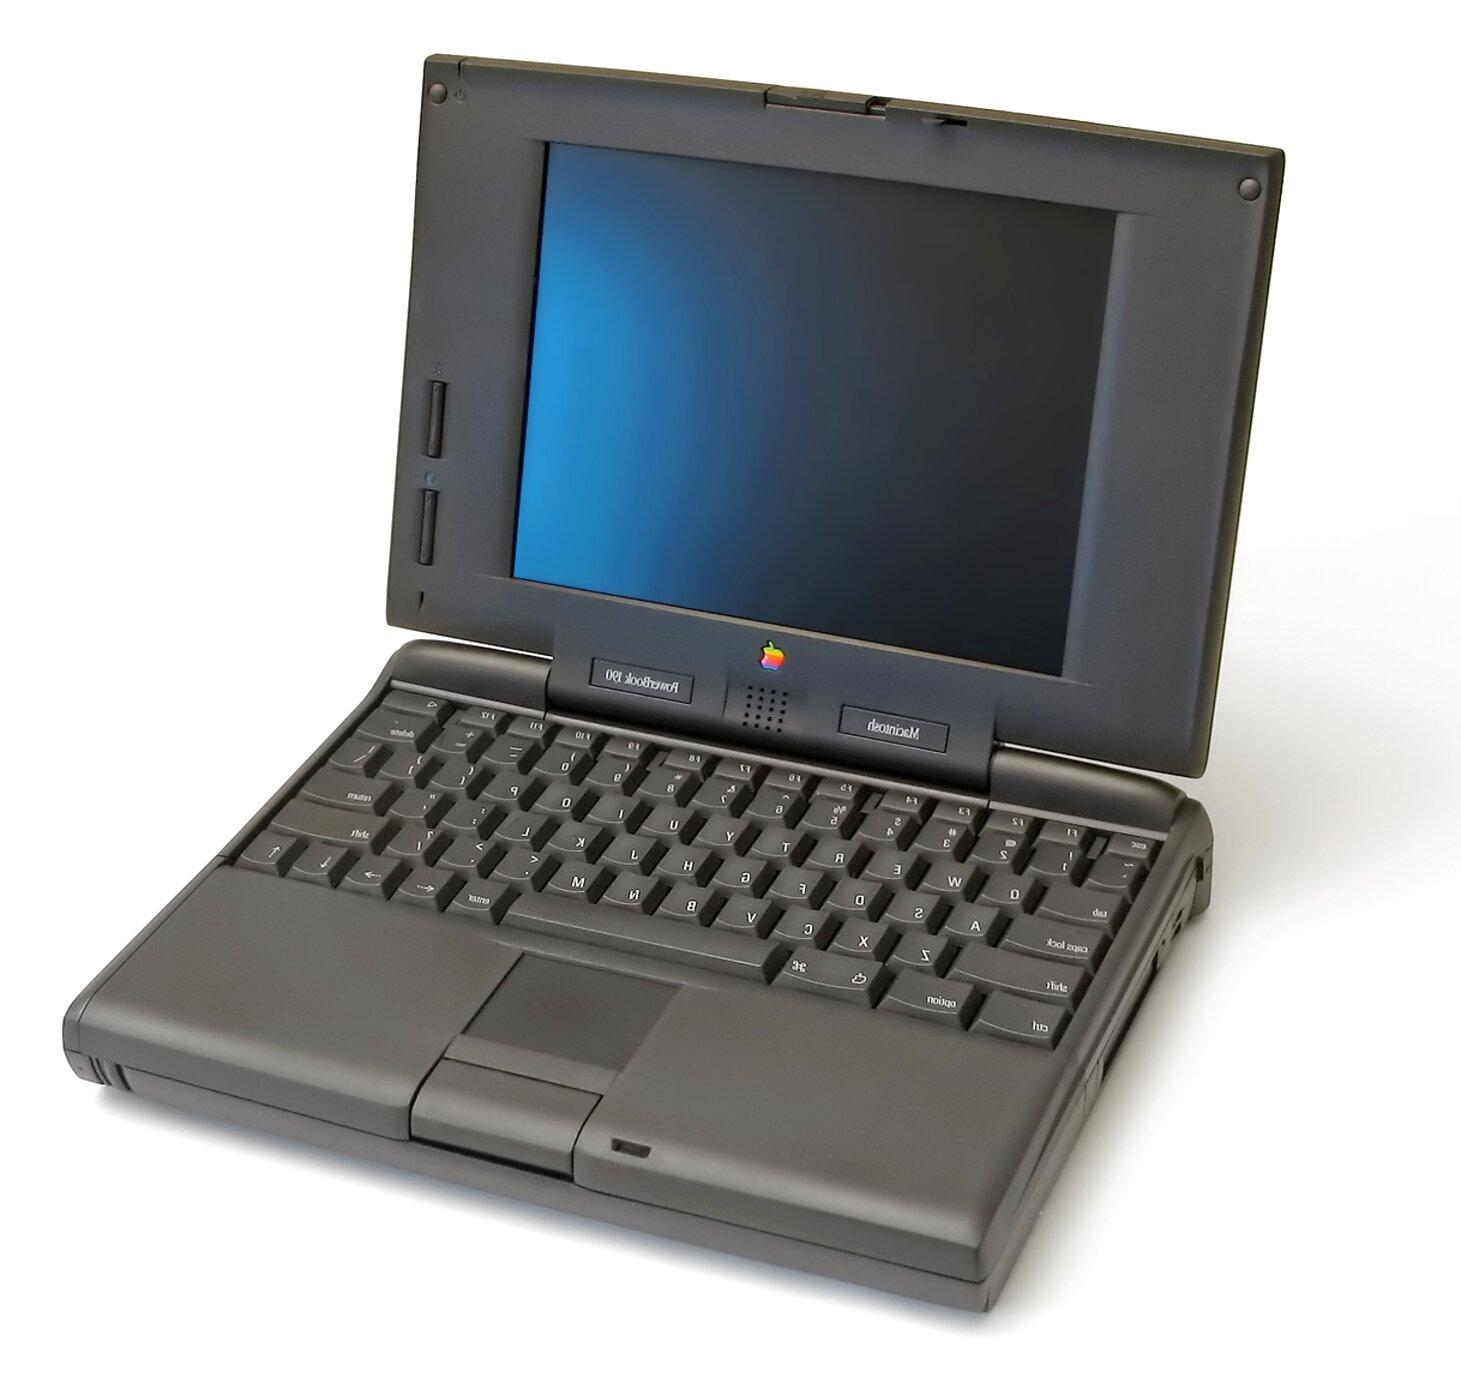 Mac Powerbook 190 Manualyellowplane